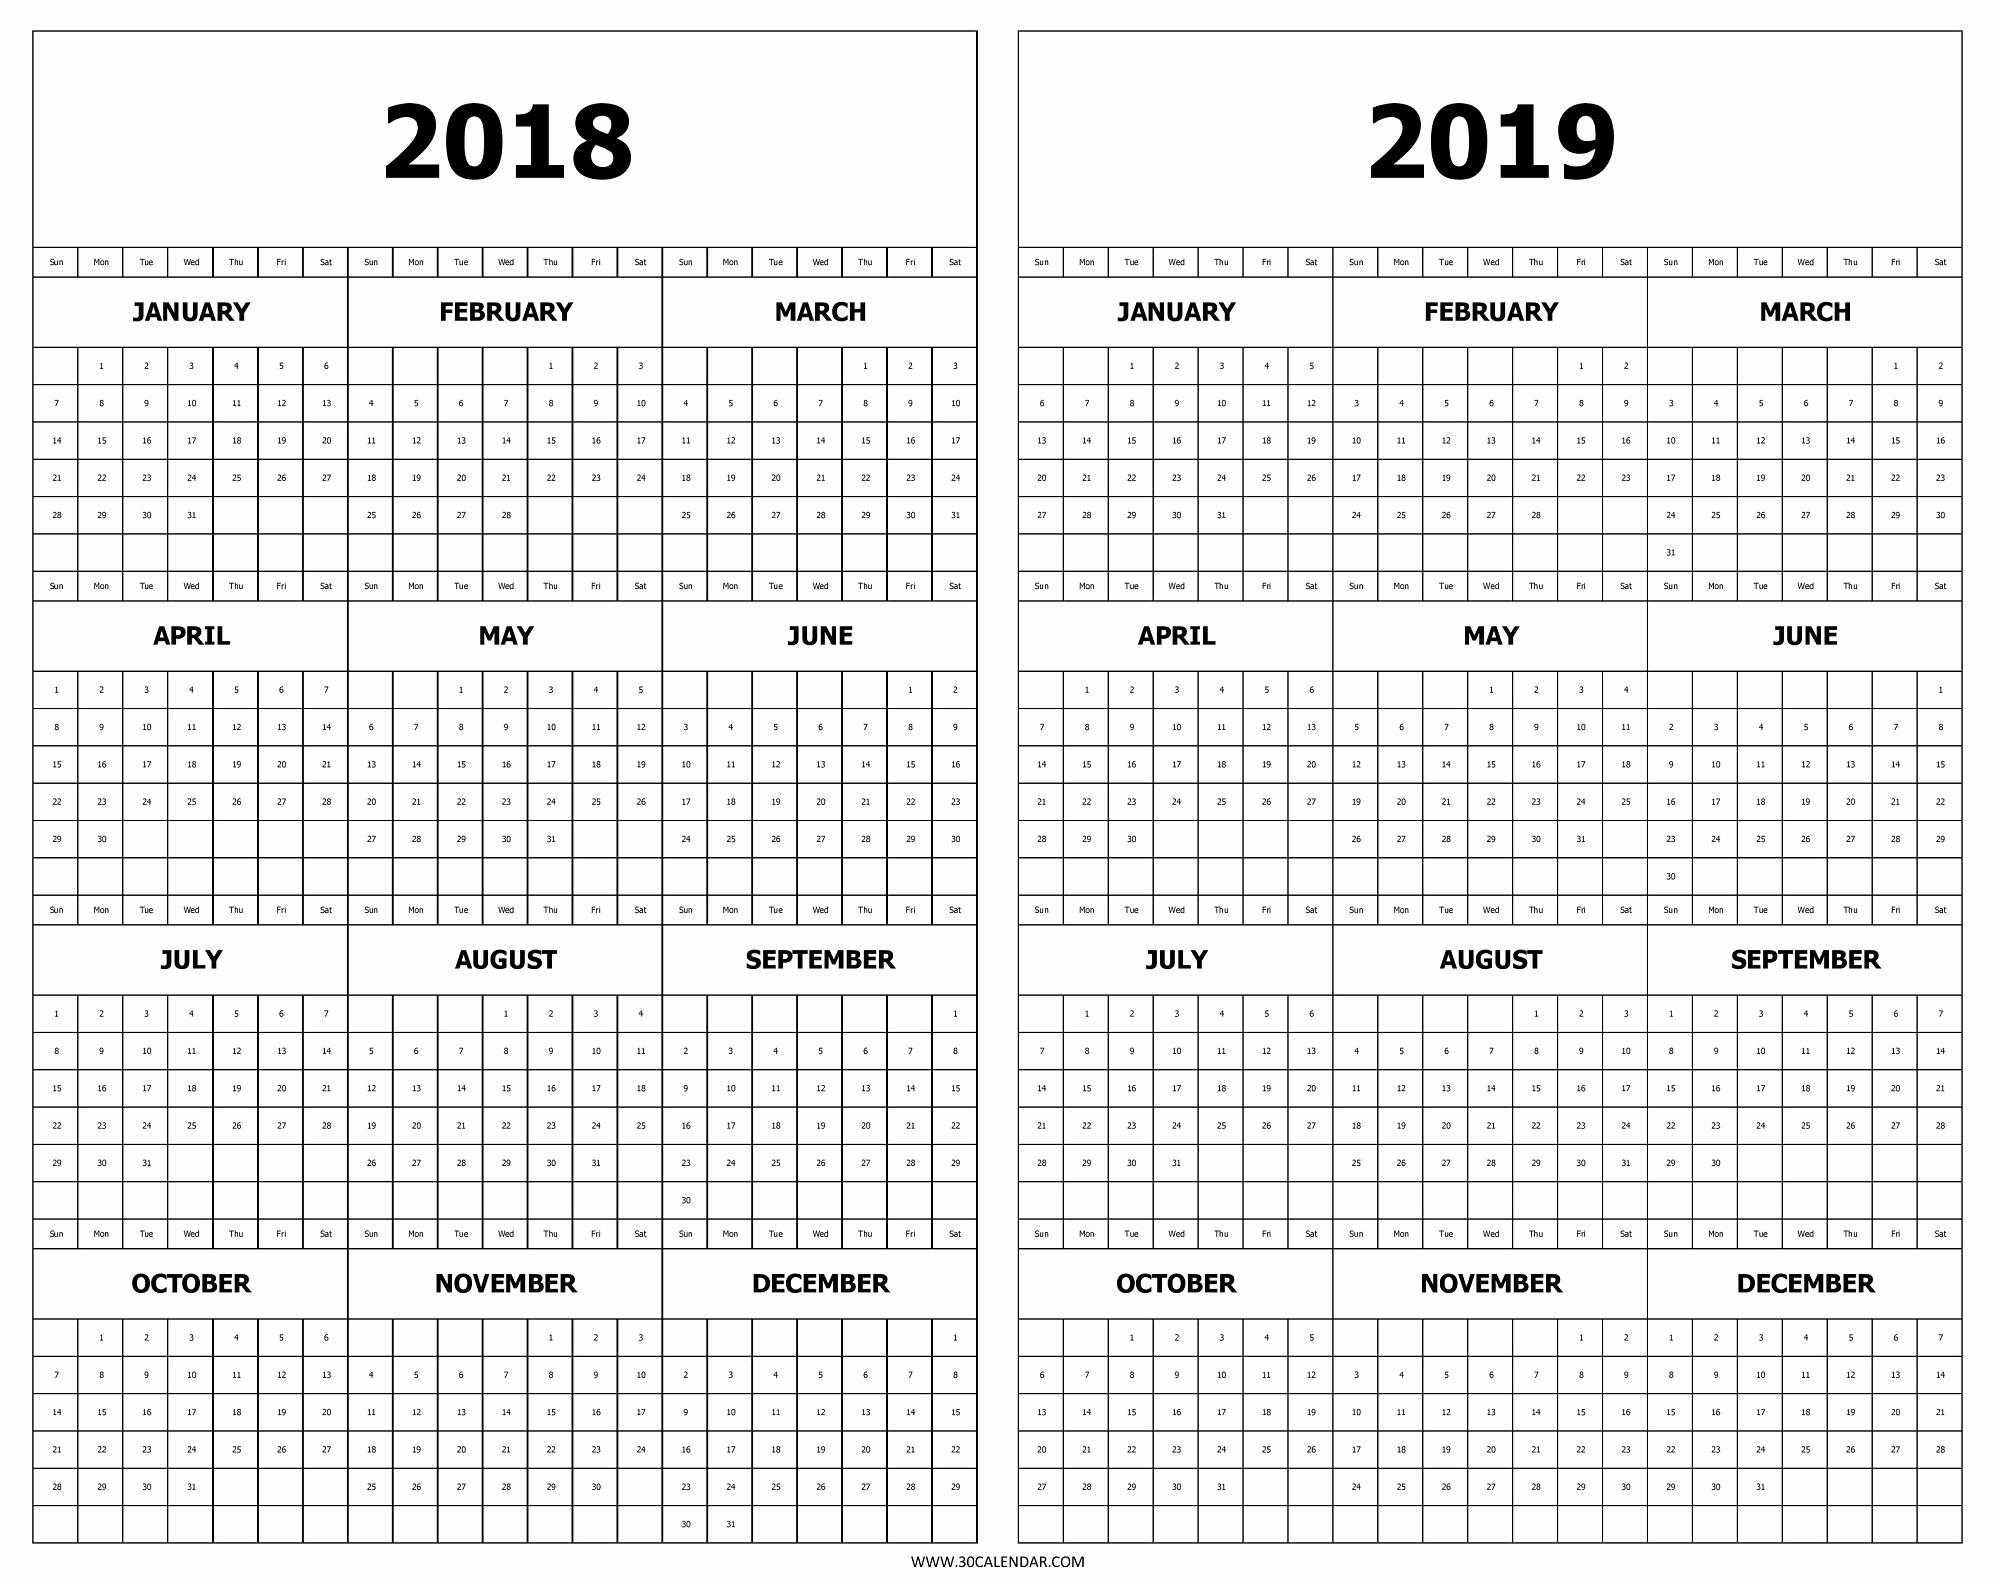 Julian Calendar 2019 2020 Free Printable Three Year Calendar 2018 in 2020 Julian Calendar Printable Pdf